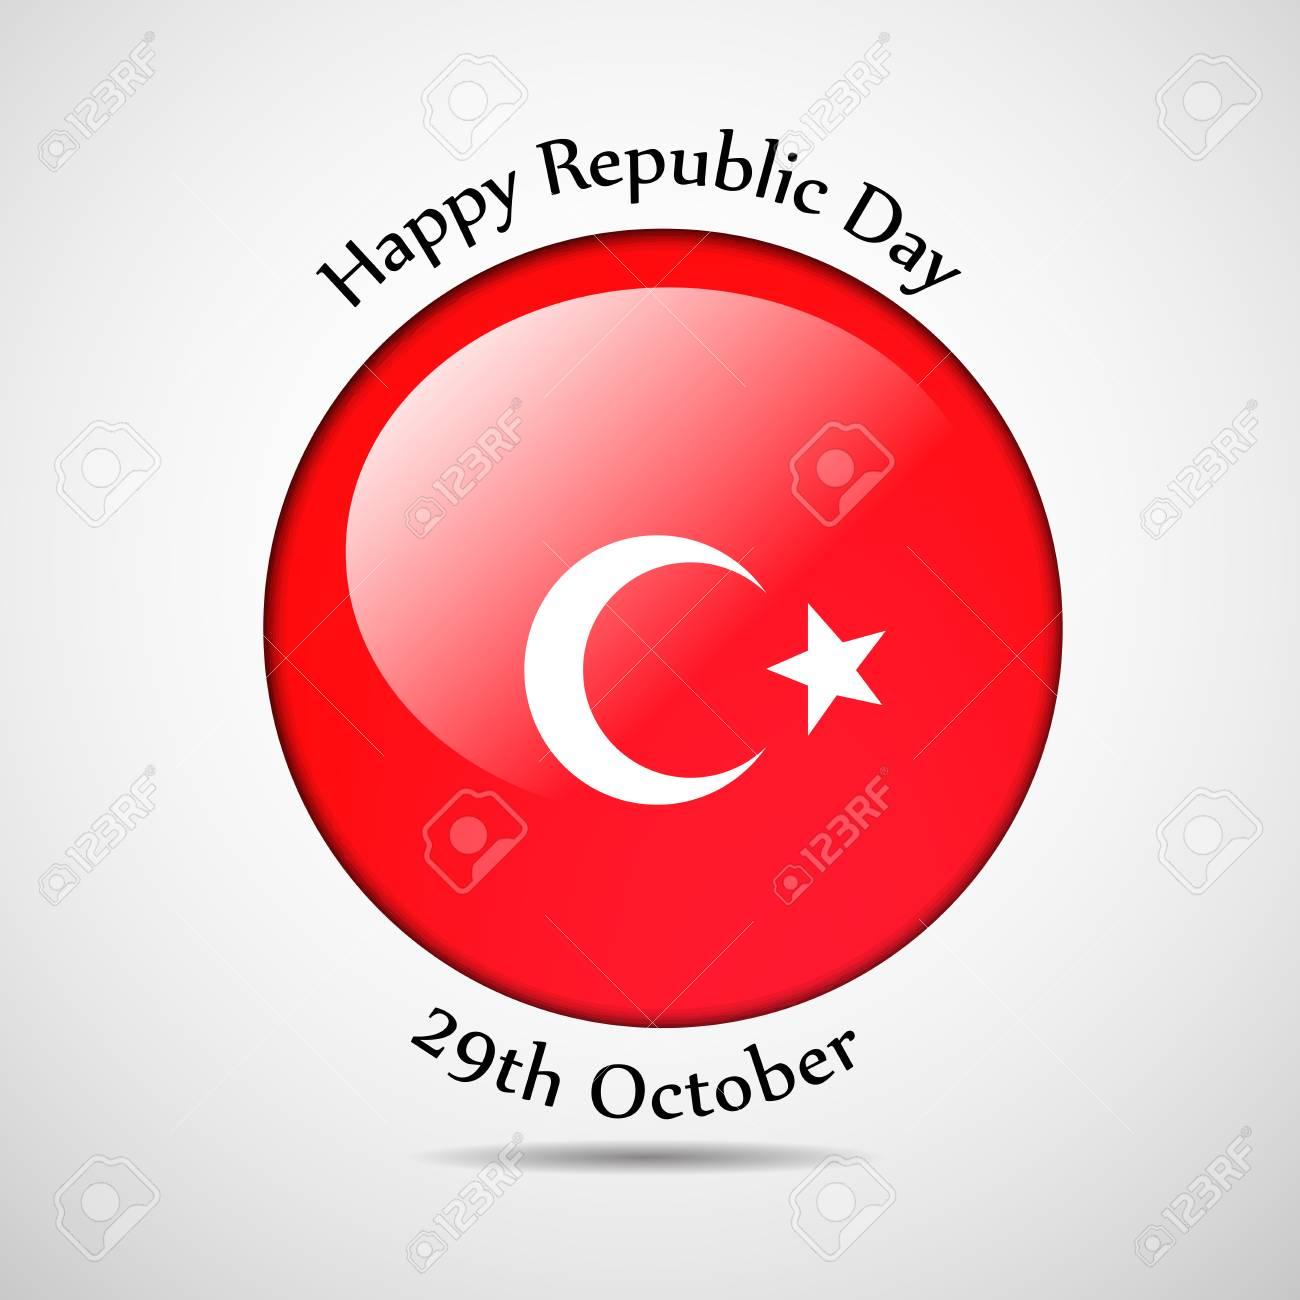 illustration of elements of turkey republic day ロイヤリティフリー